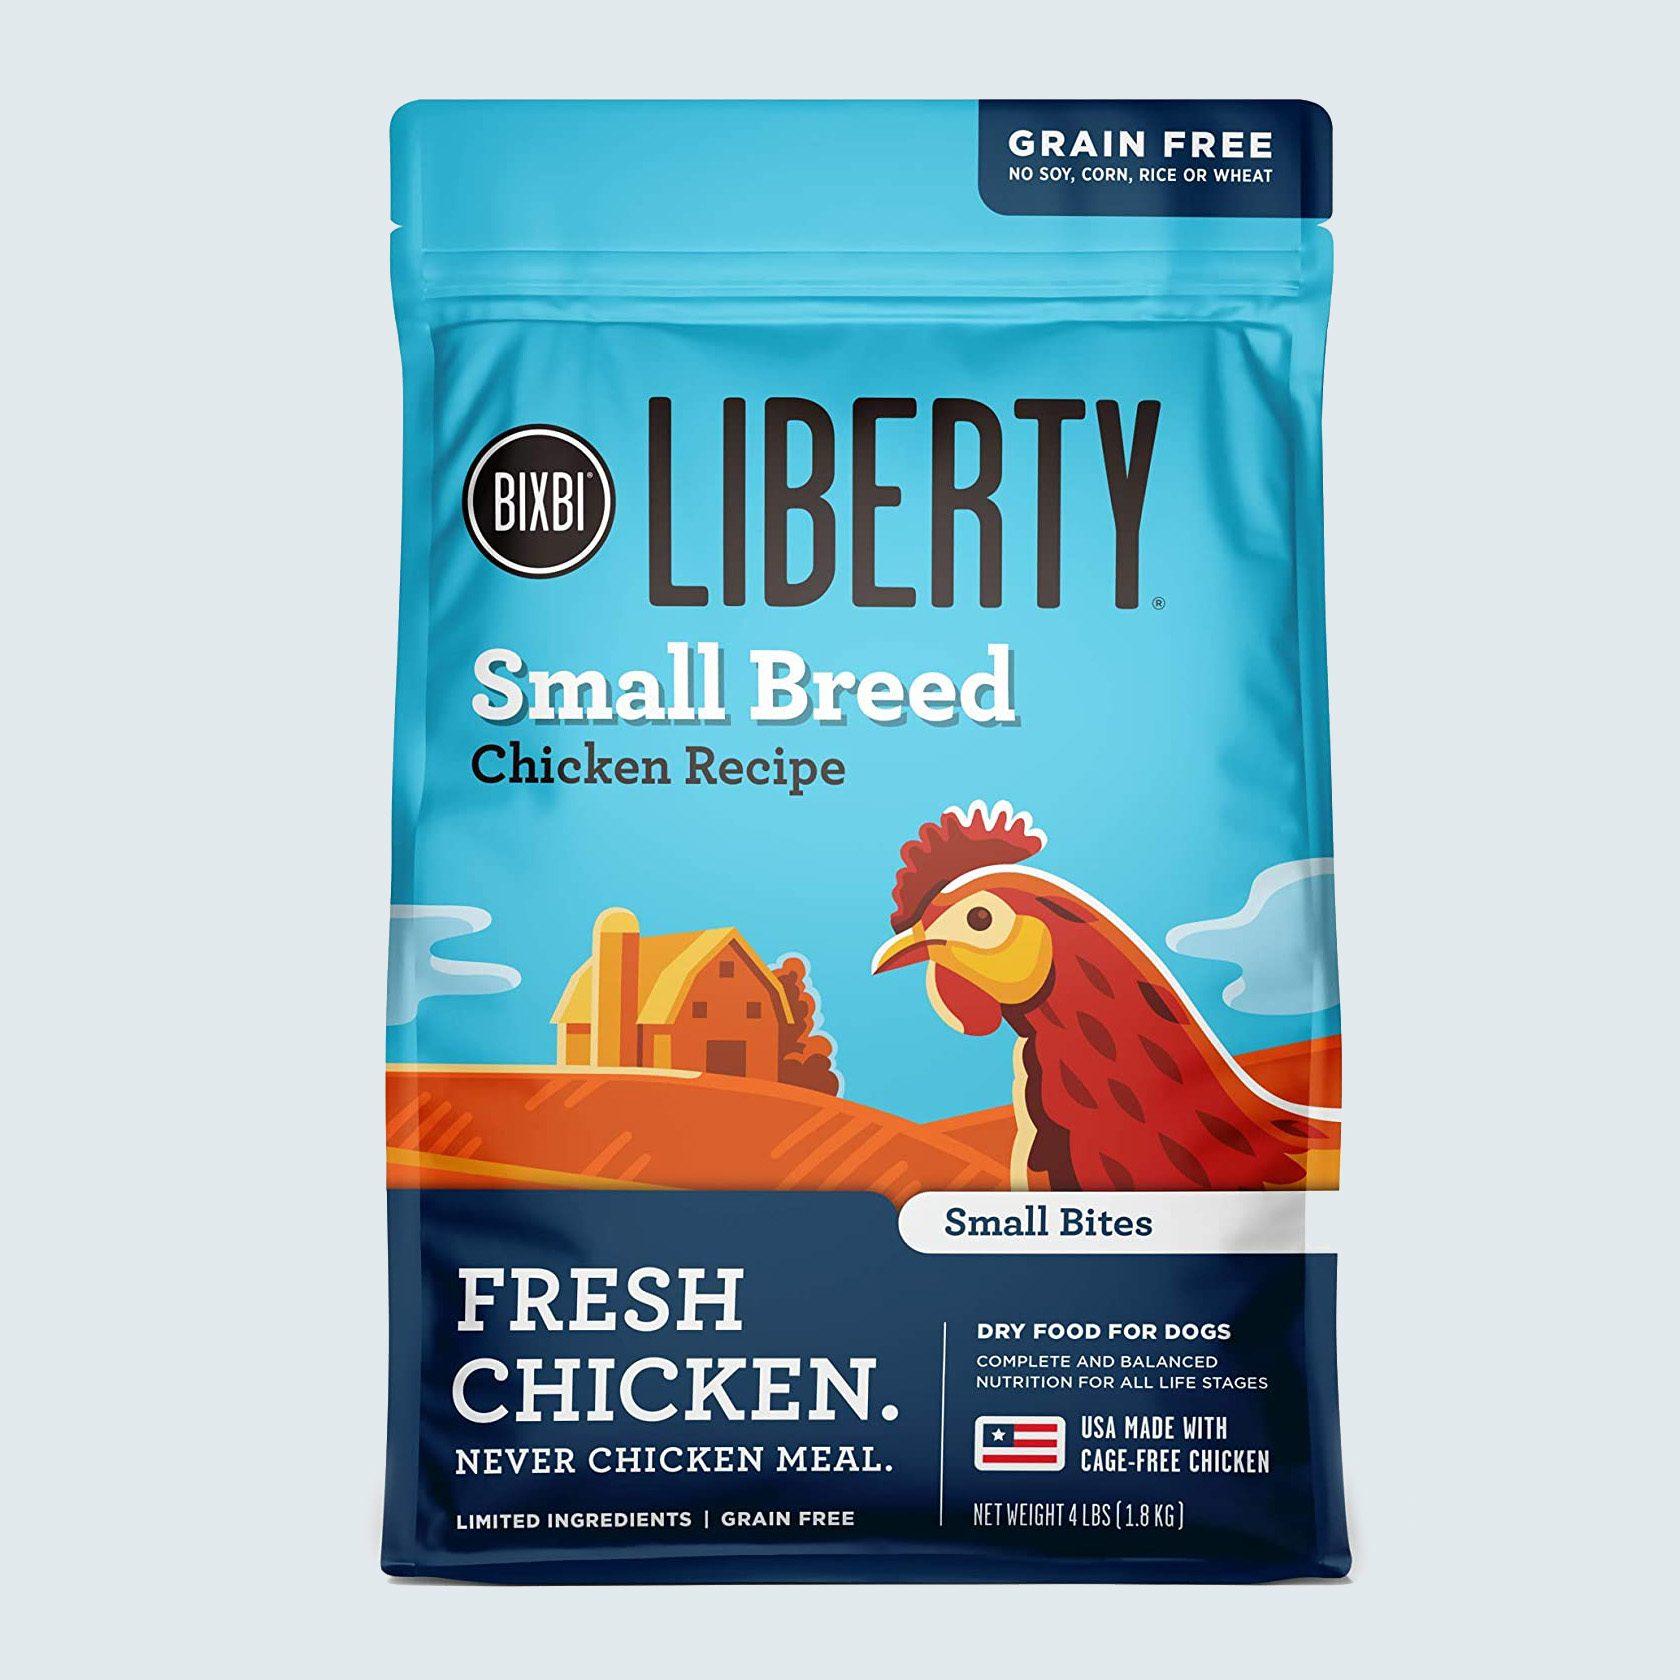 Bixbi liberty dog food